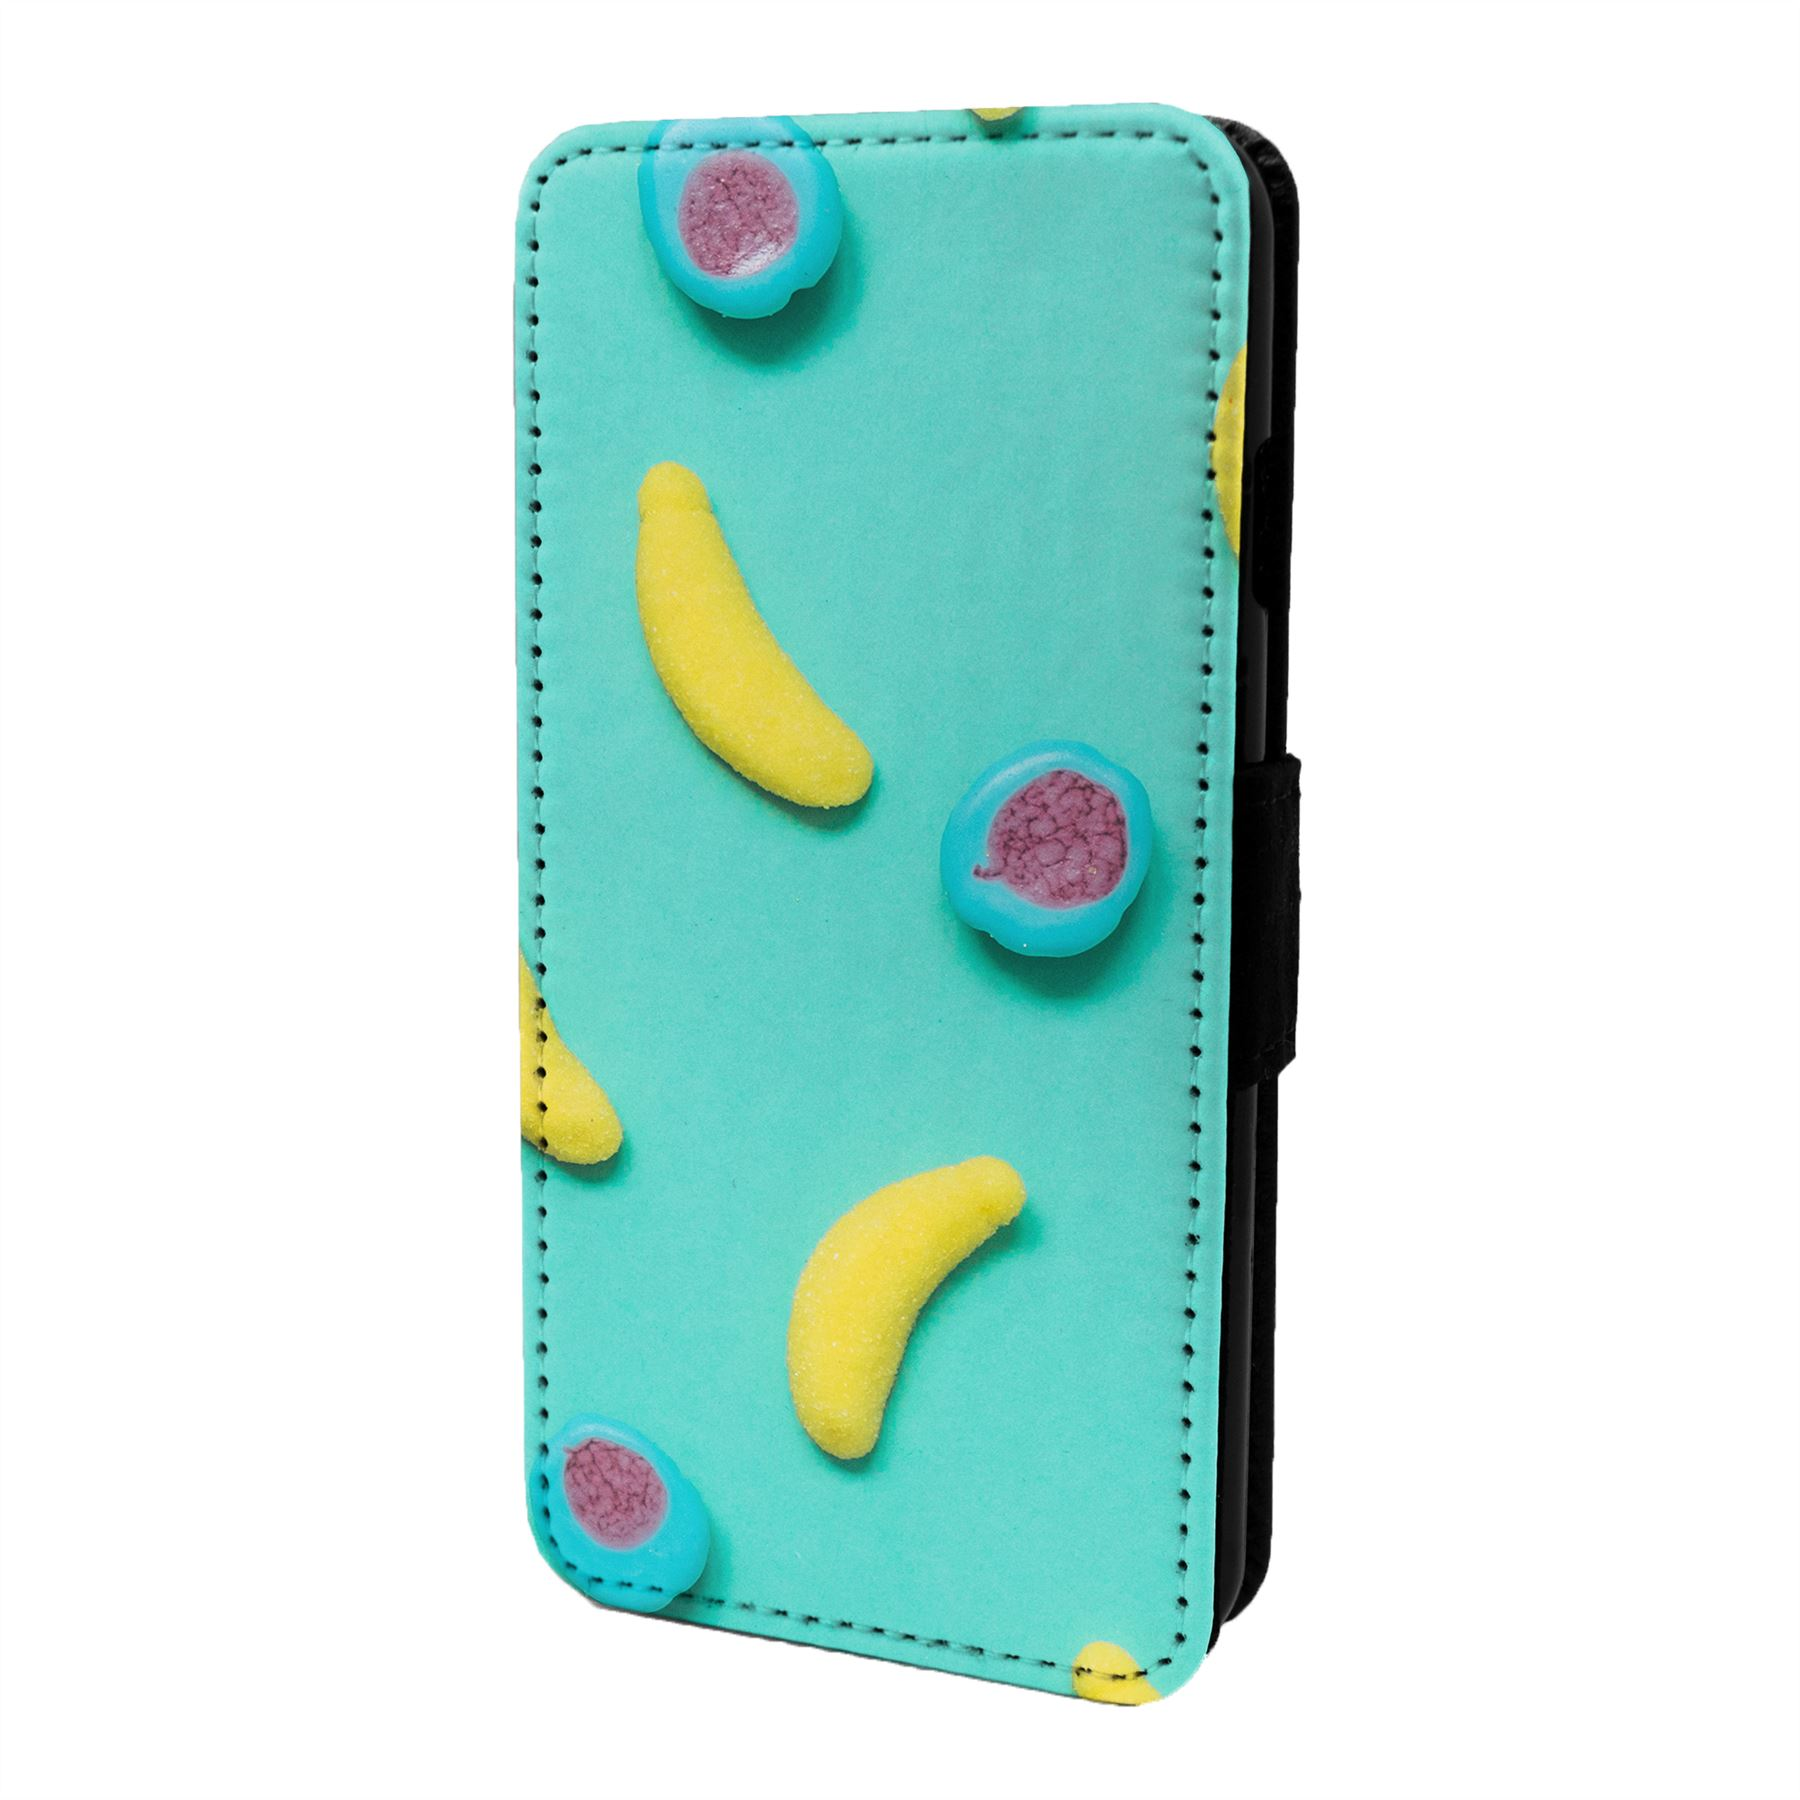 Banana-Pastel-Funda-Libro-para-Telefono-Movil-S6591